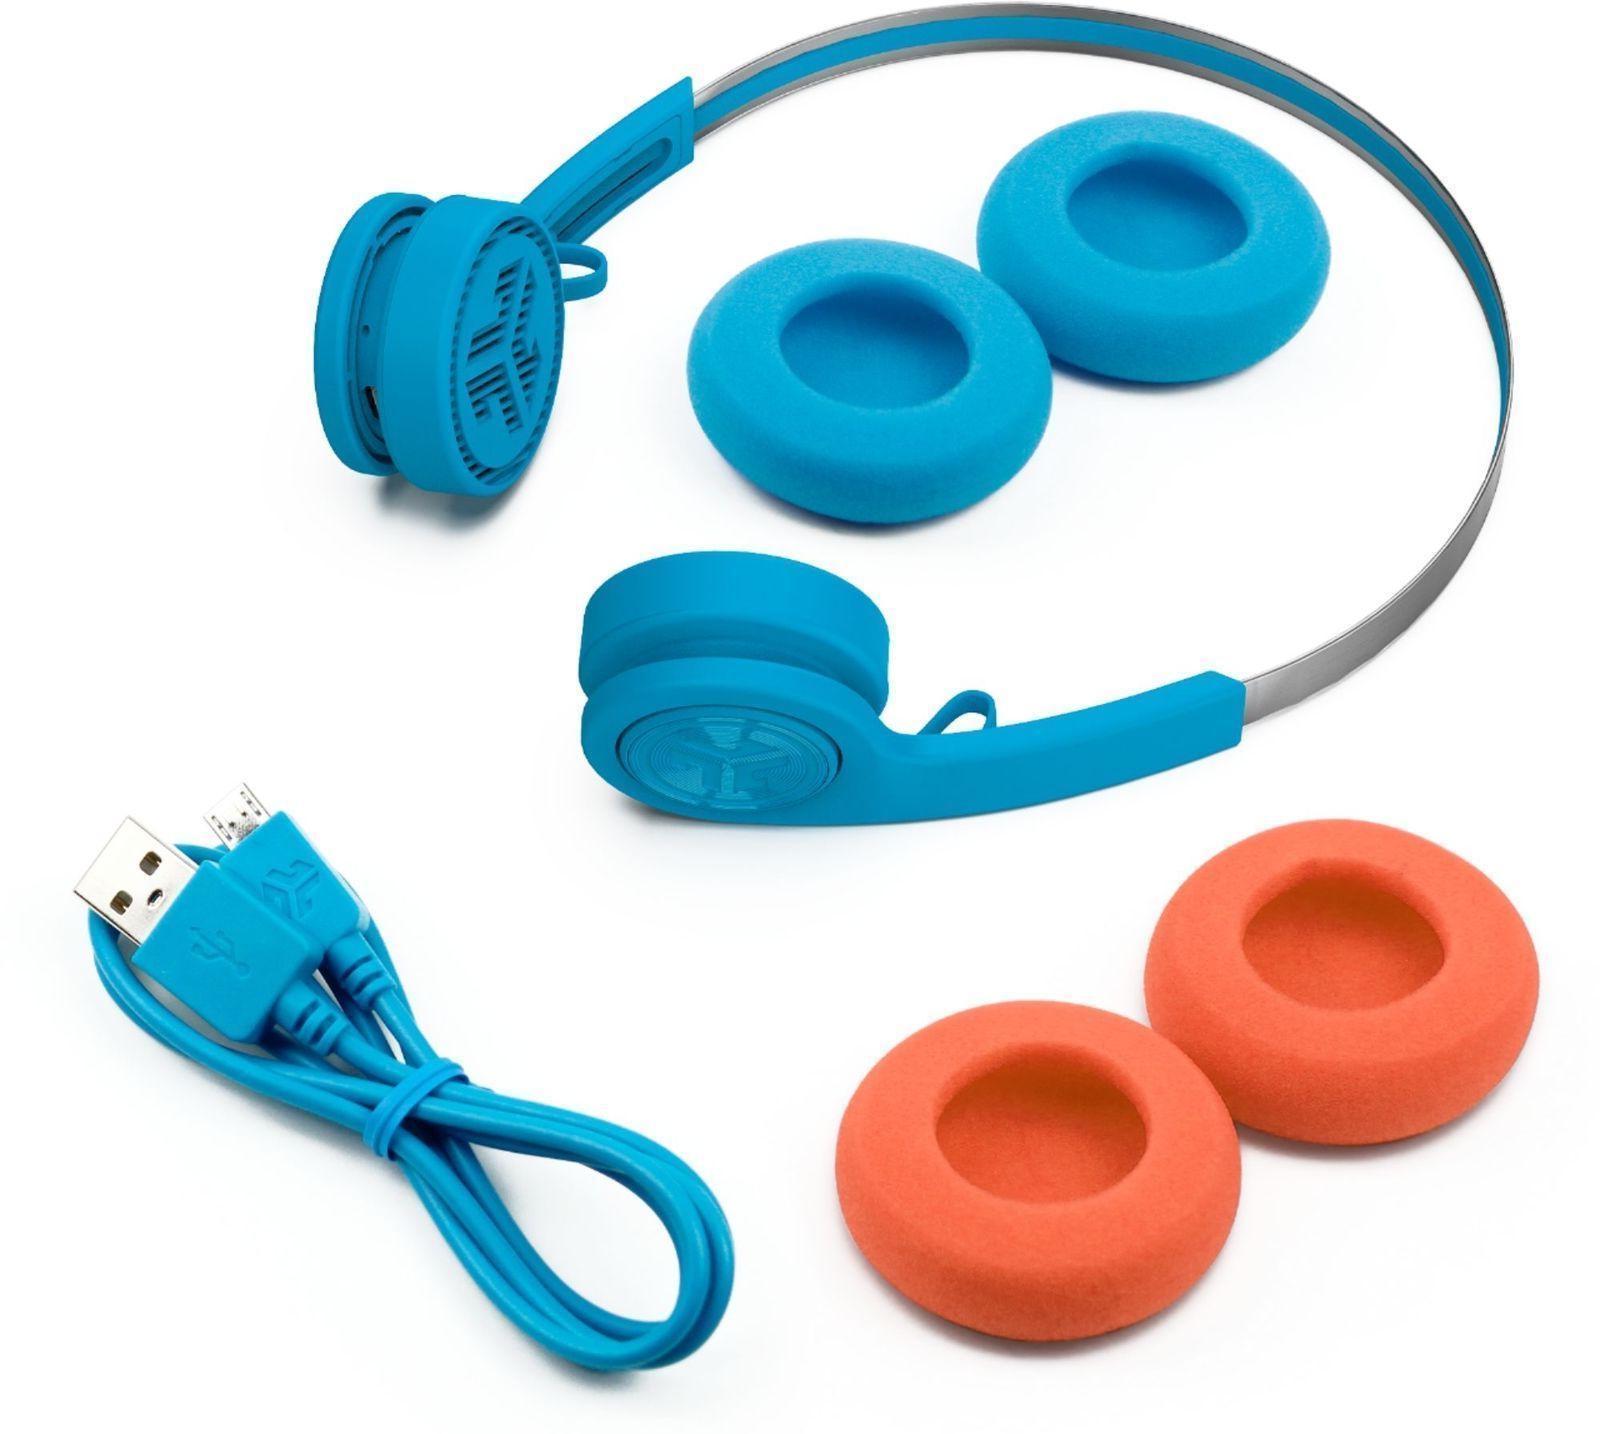 7d1dbaa14a4 Editorial Pick JLab Audio Rewind Wireless Retro Bluetooth Headphones